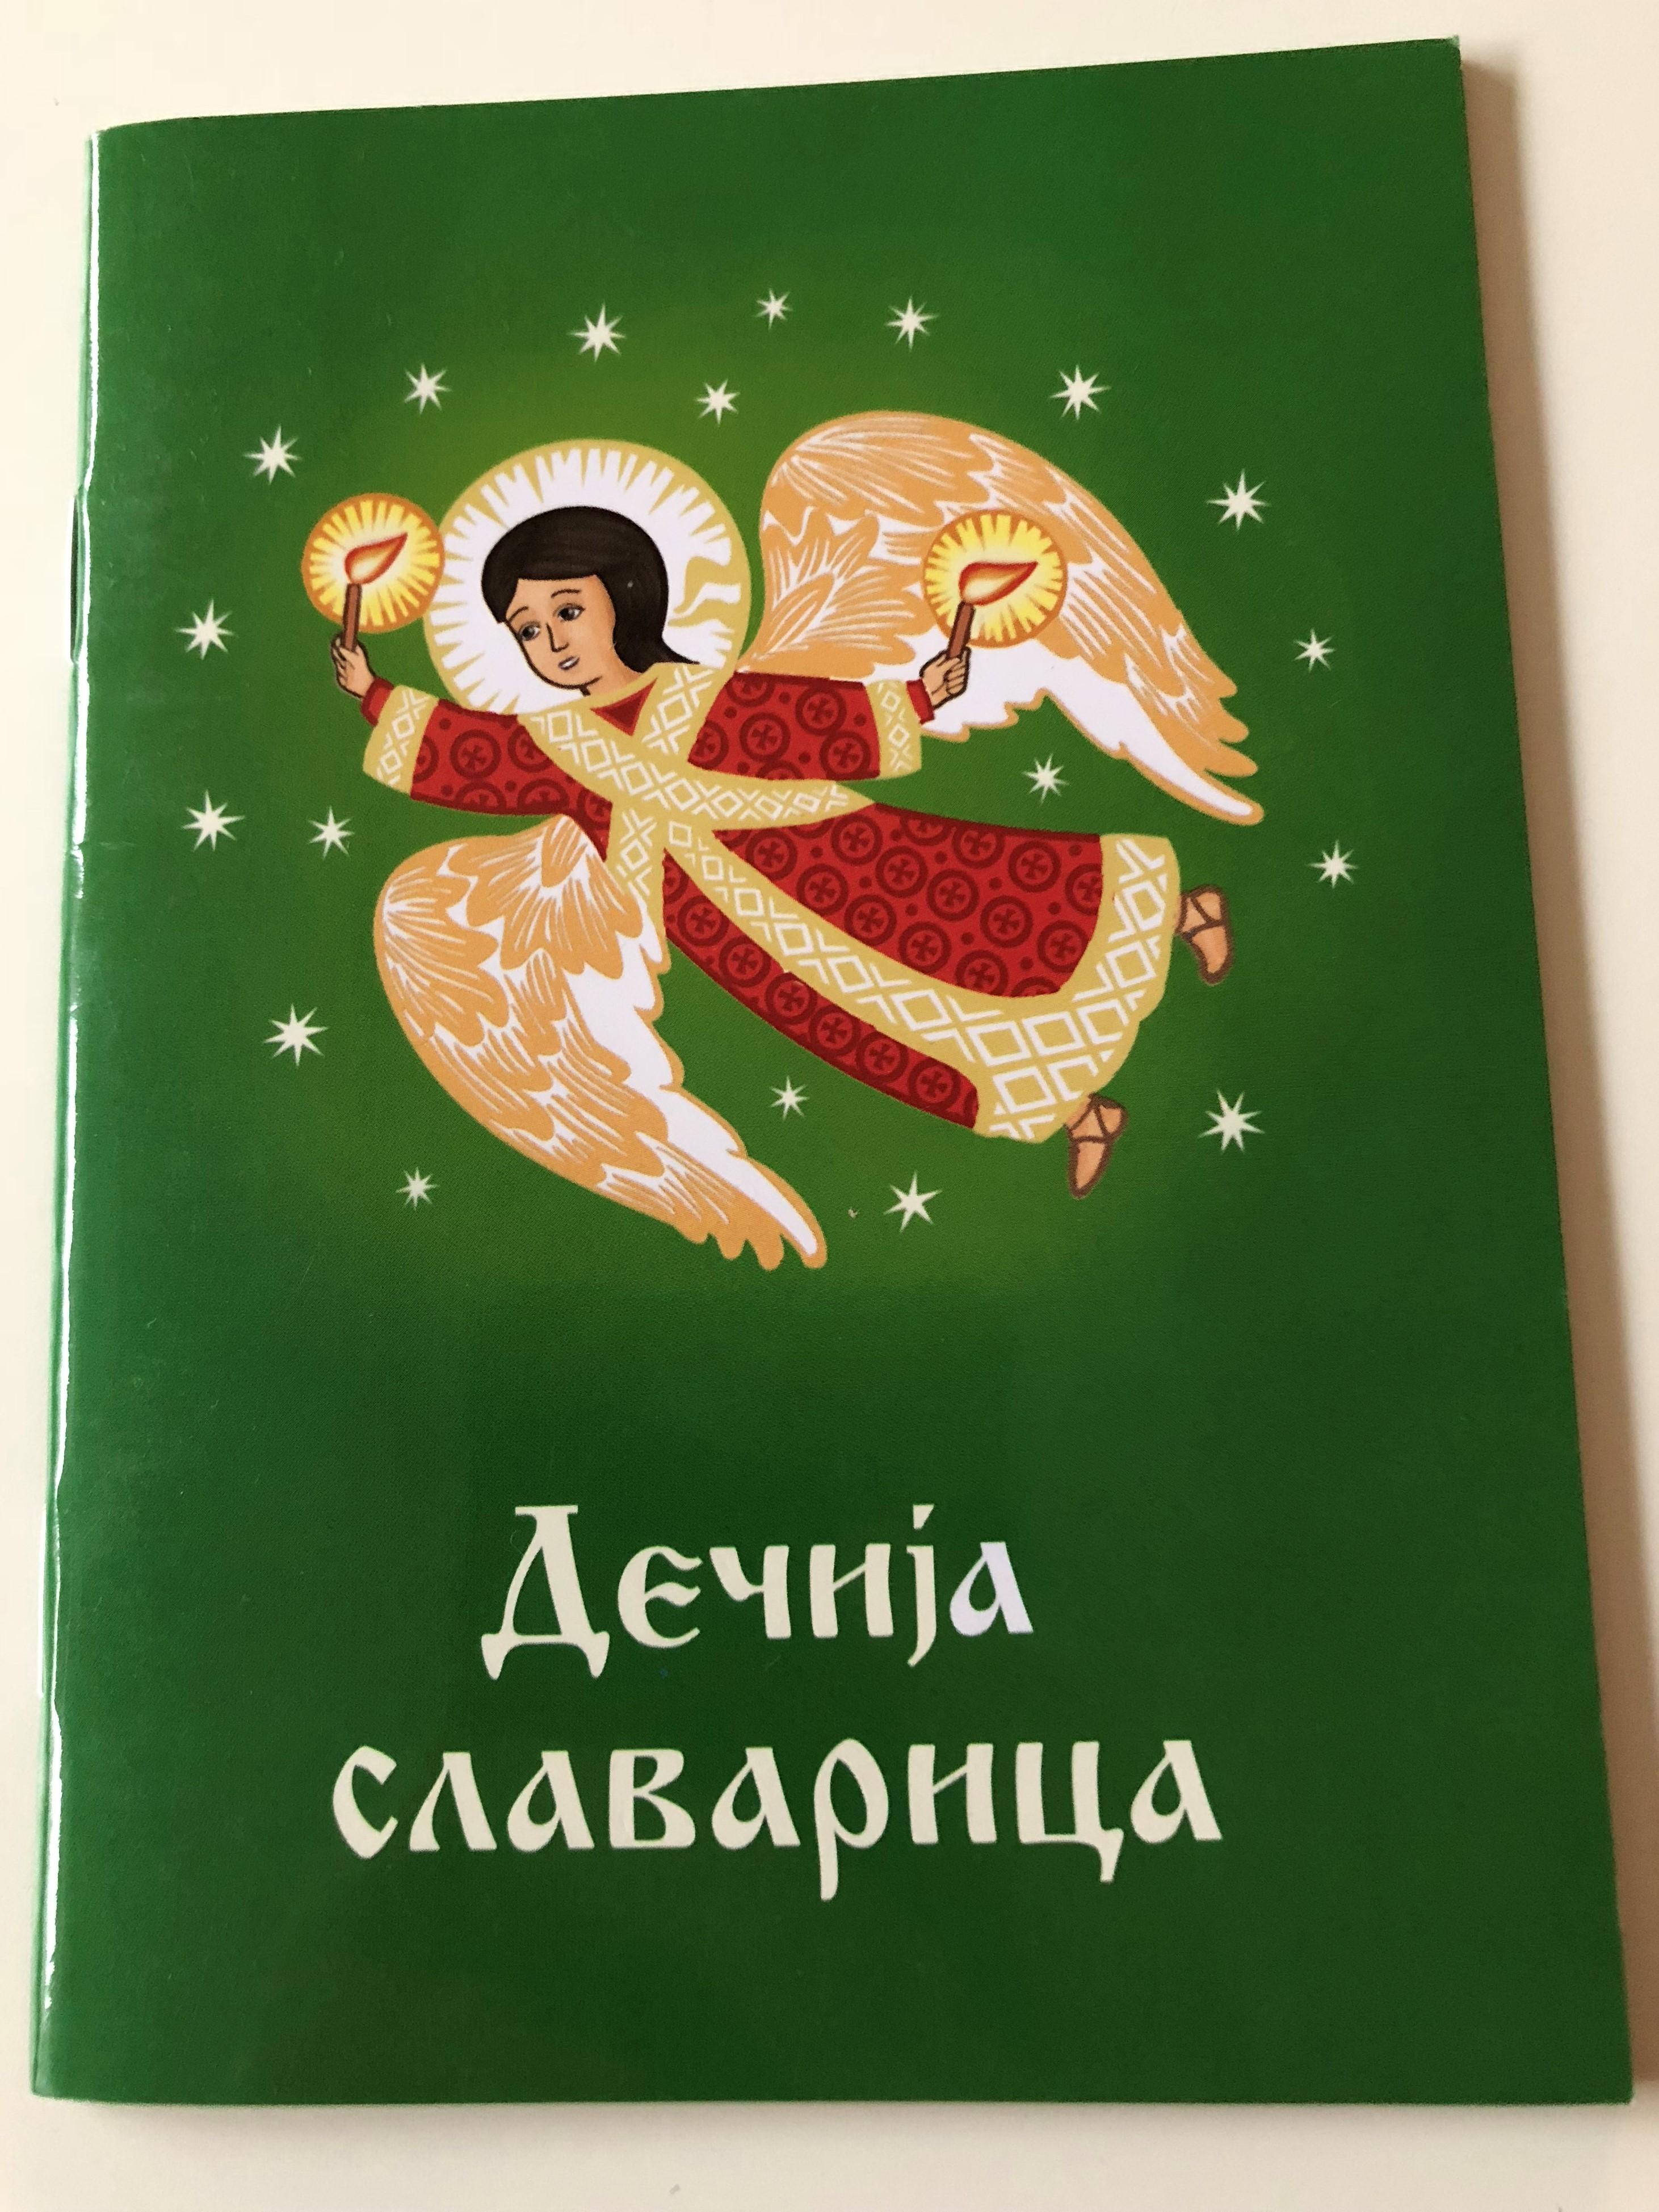 serbian-childrens-poems-orthodox-feasts-1-.jpg